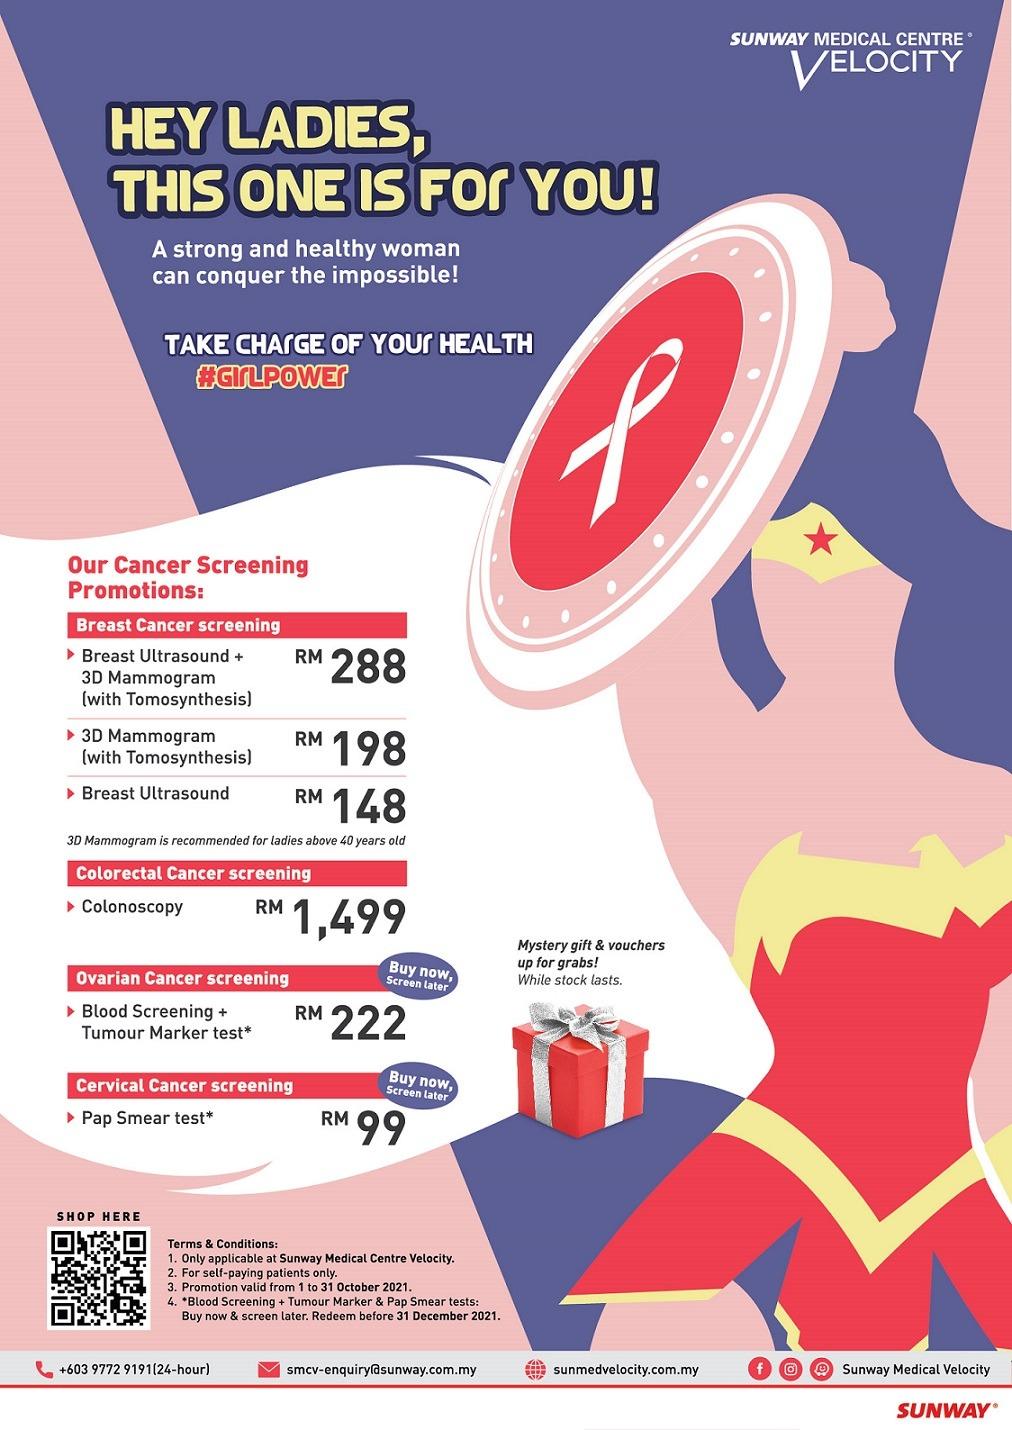 #GIRLPOWER: SMCV Spotlights Women's Health & Wellbeing This Breast Cancer Awareness Month